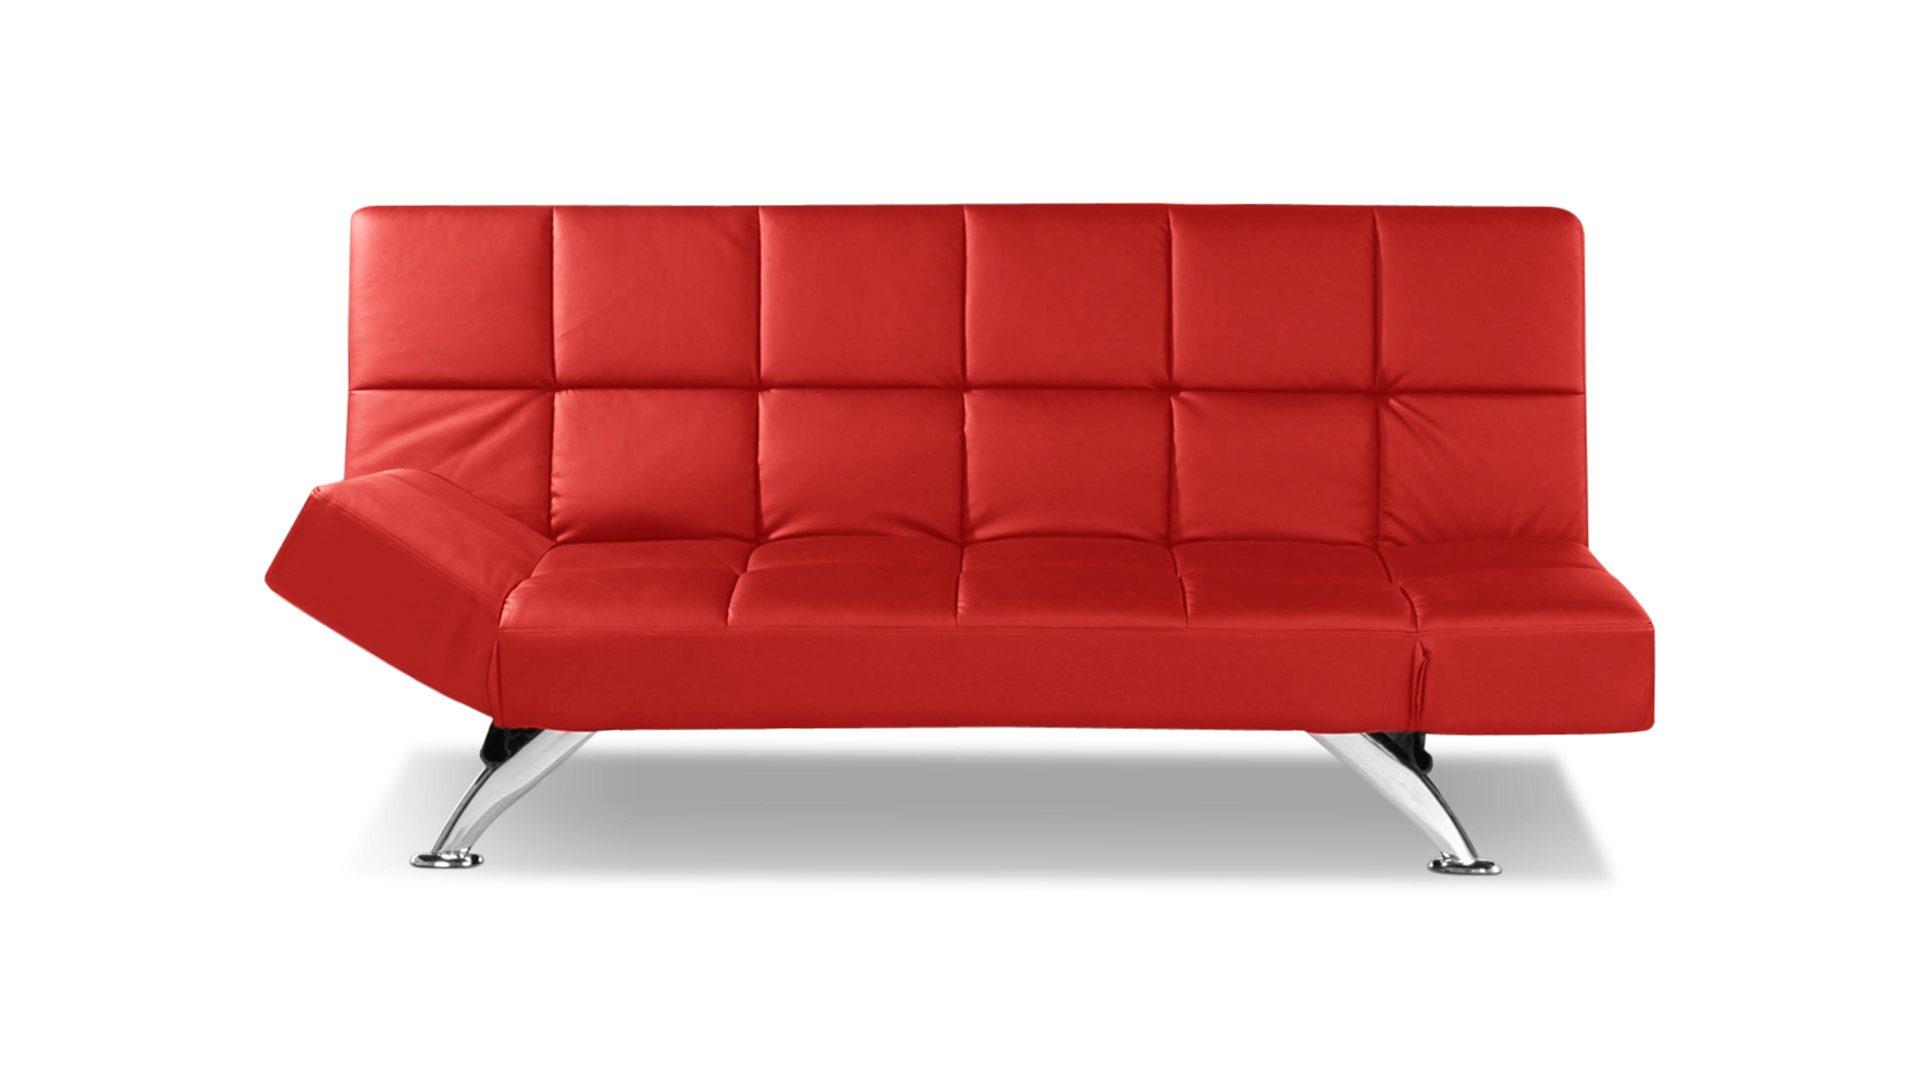 sofa kinderzimmer | jtleigh.com - hausgestaltung ideen - Wohnzimmer Sofa Rot